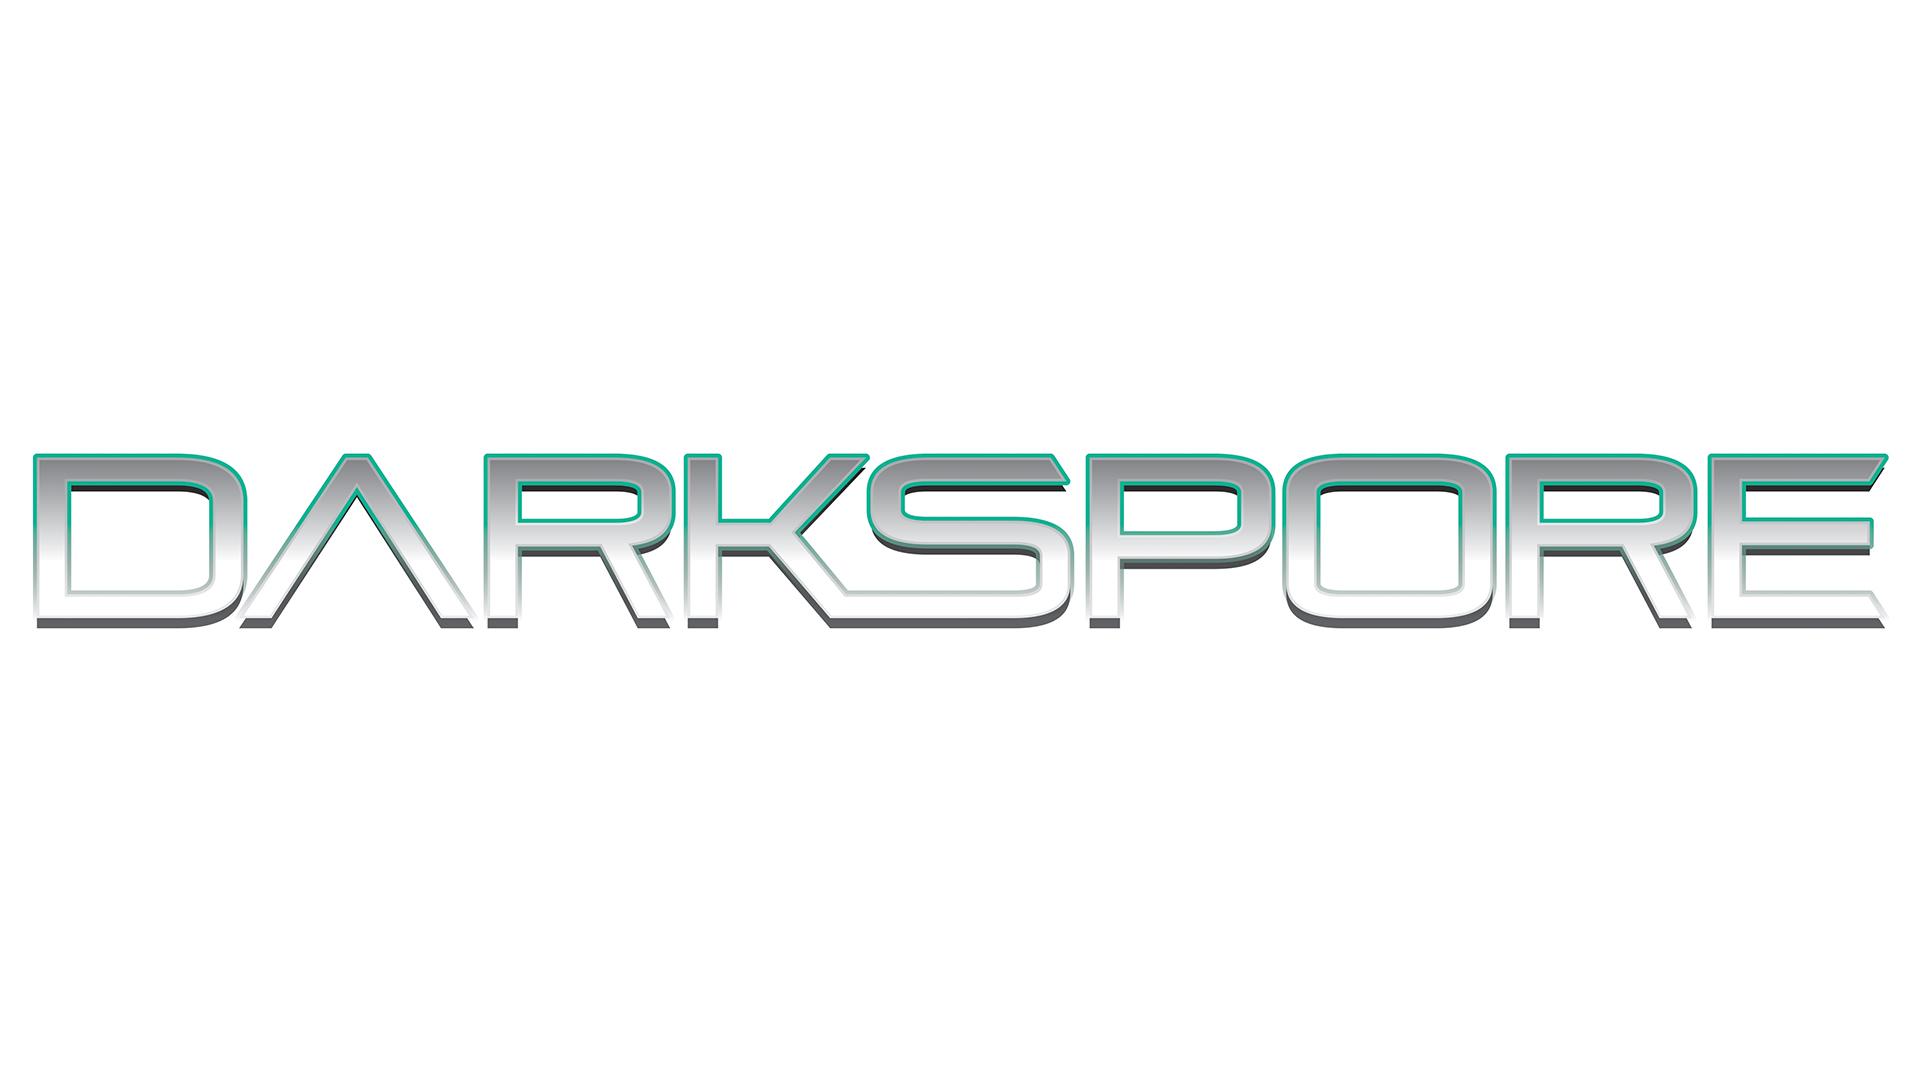 Darkspore wallpaper 4